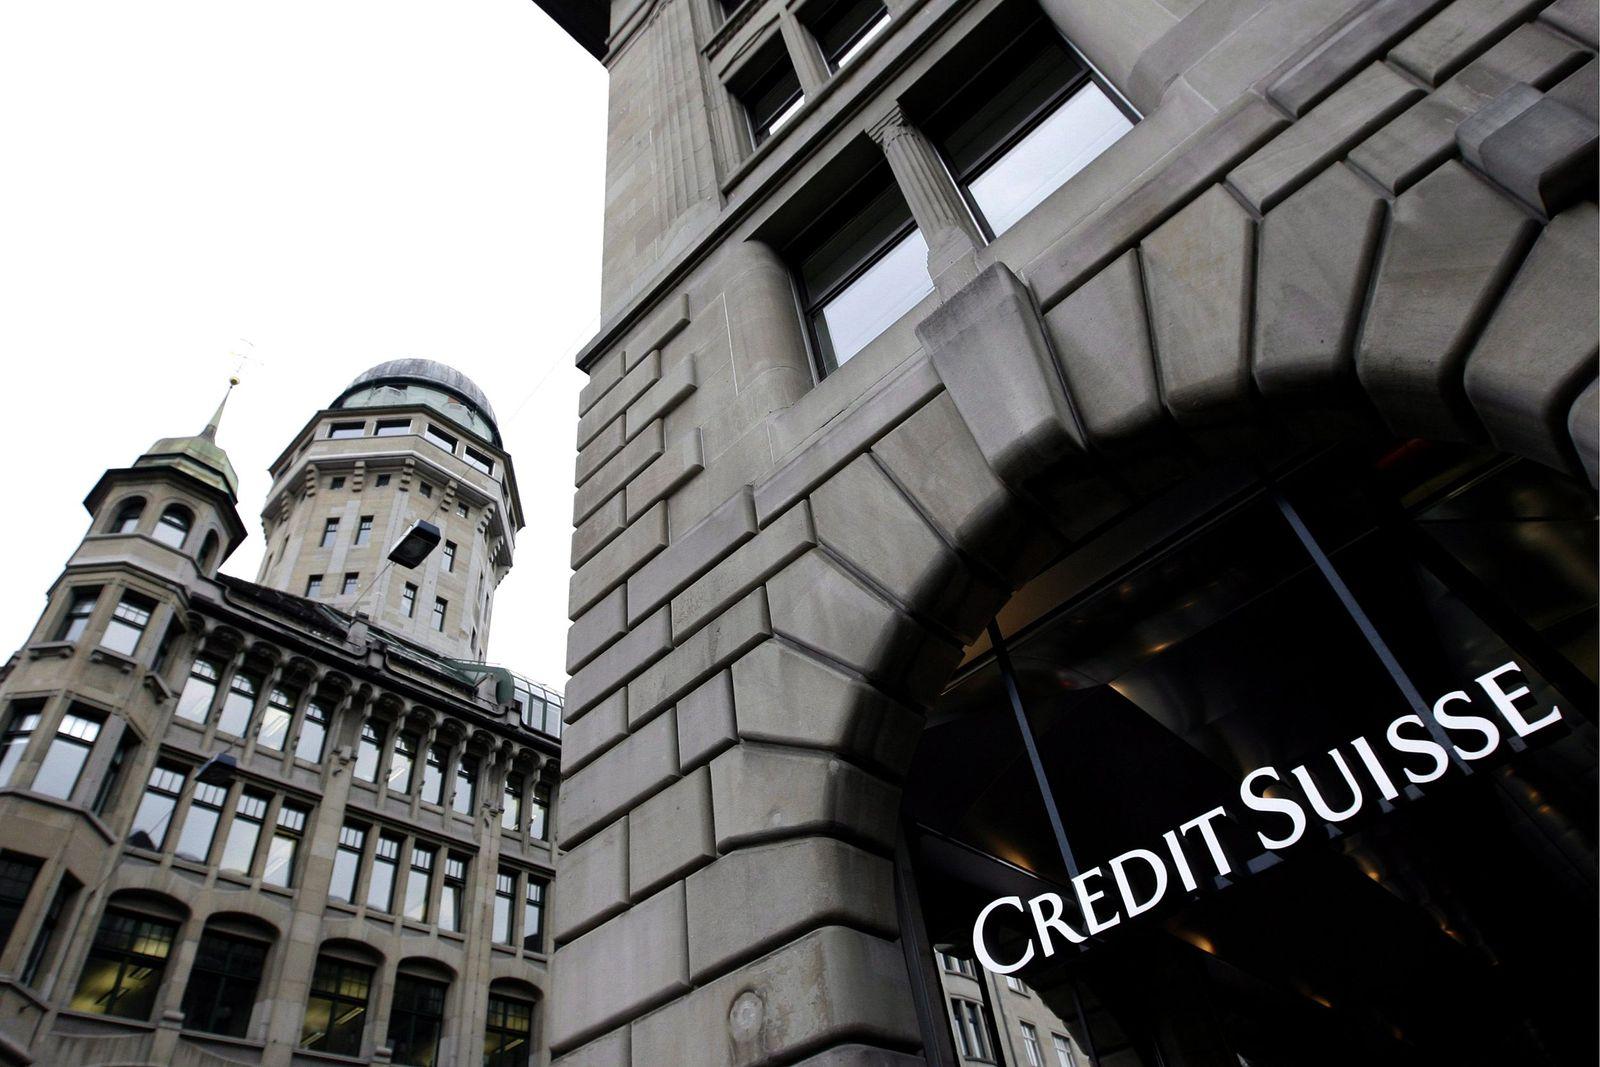 Zürich/ Credit Suisse